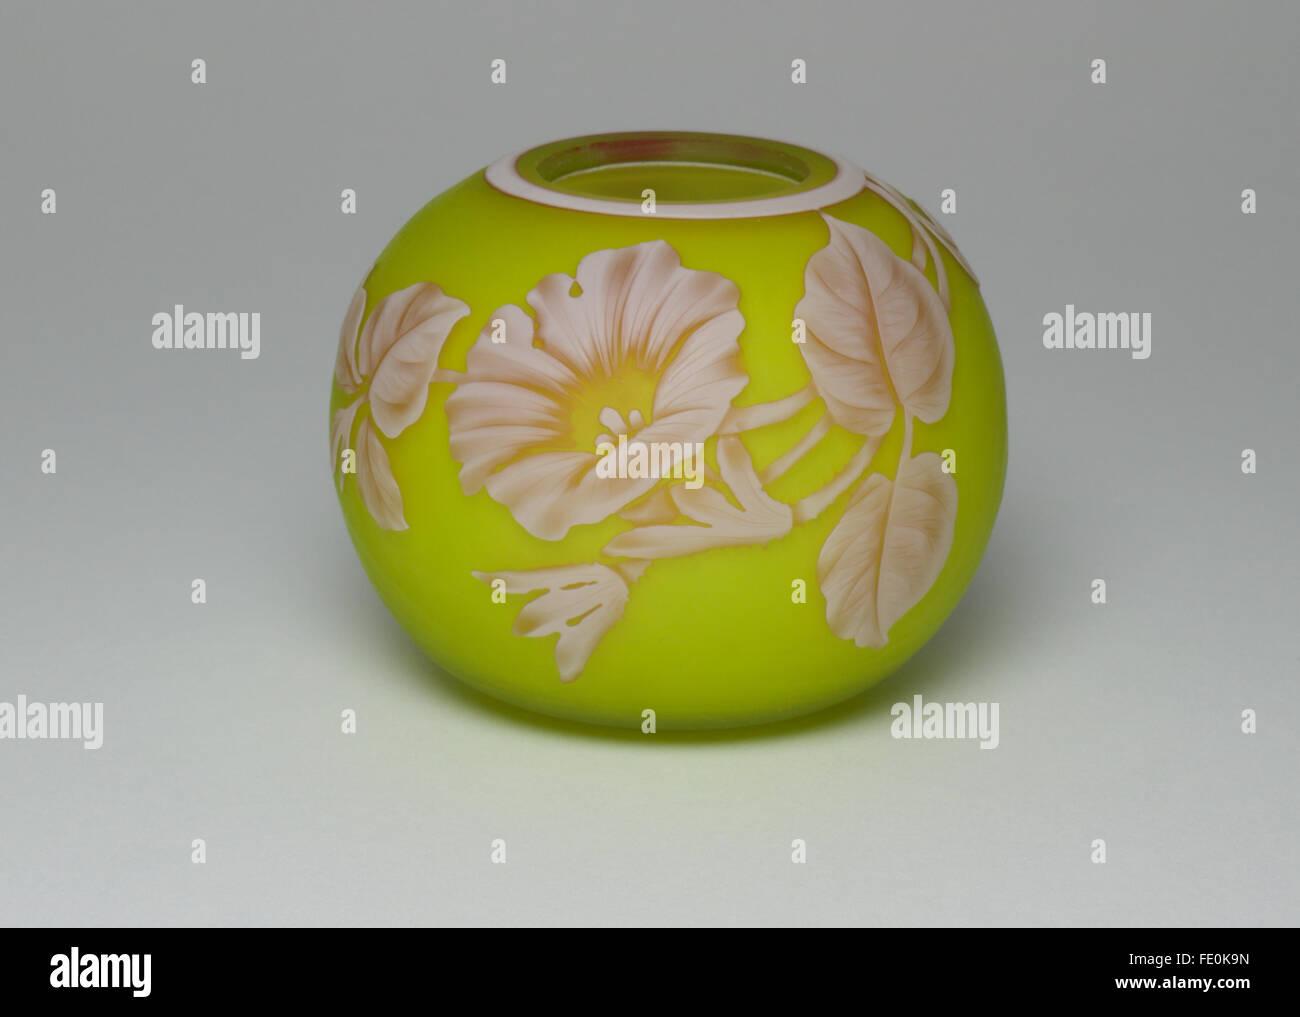 Antique 19th century Webb cameo glass vase - Stock Image